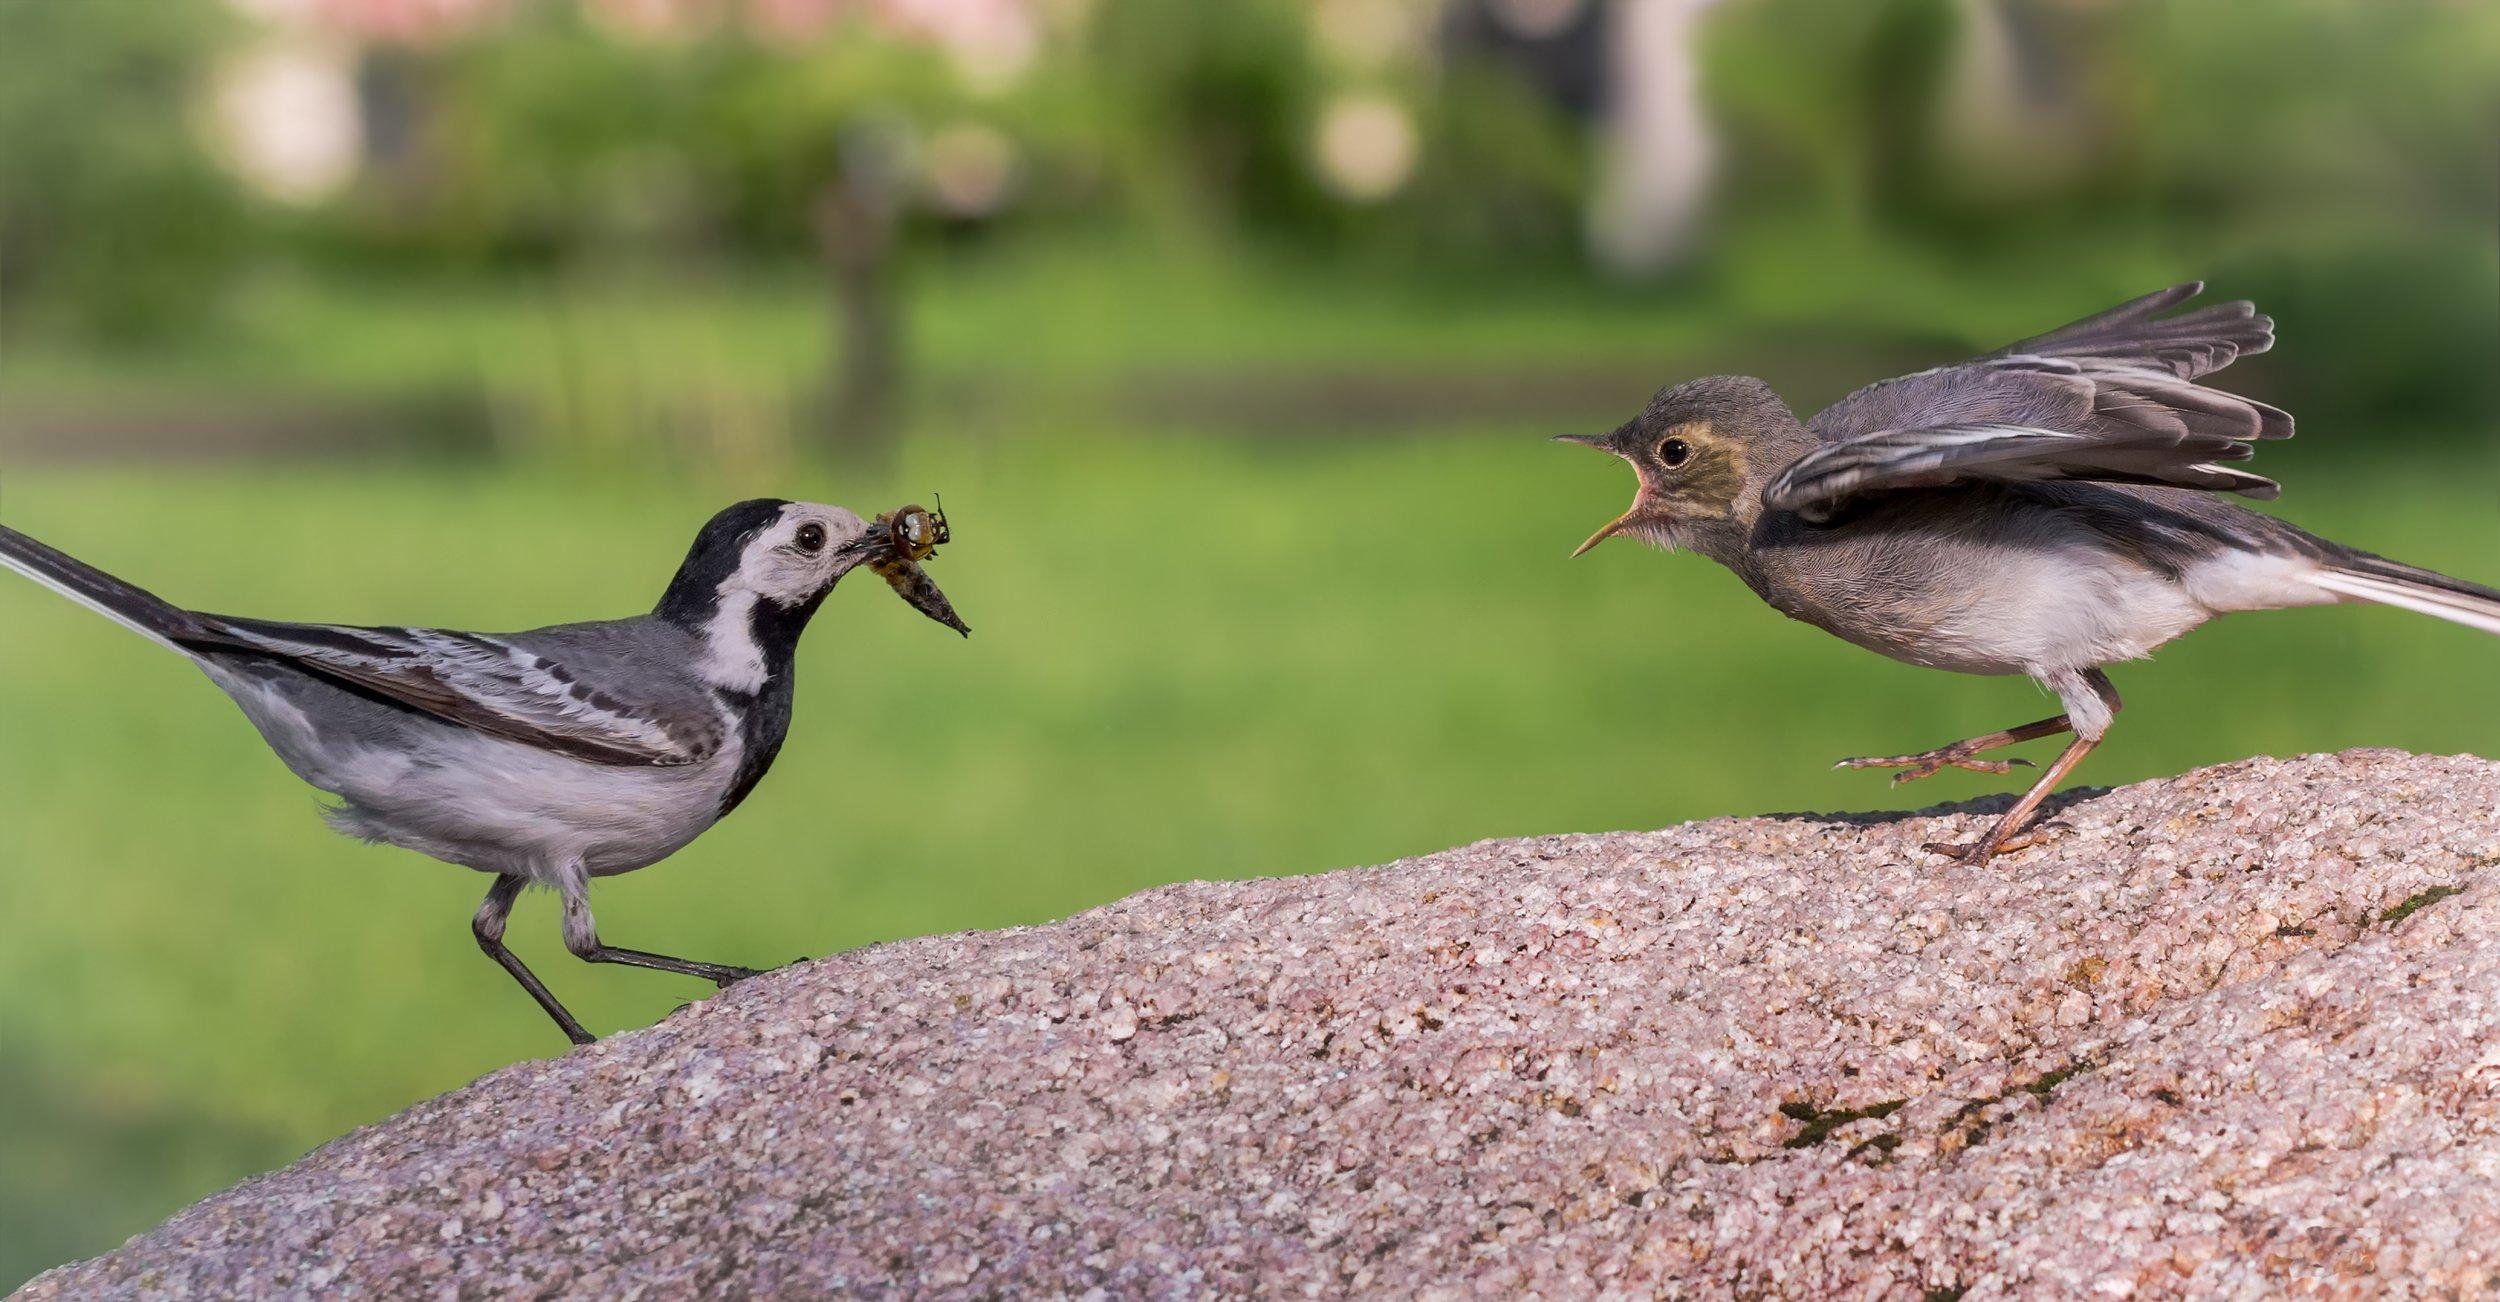 птица, серая трясогузка, птенец, слёток,, Мочалова Марина